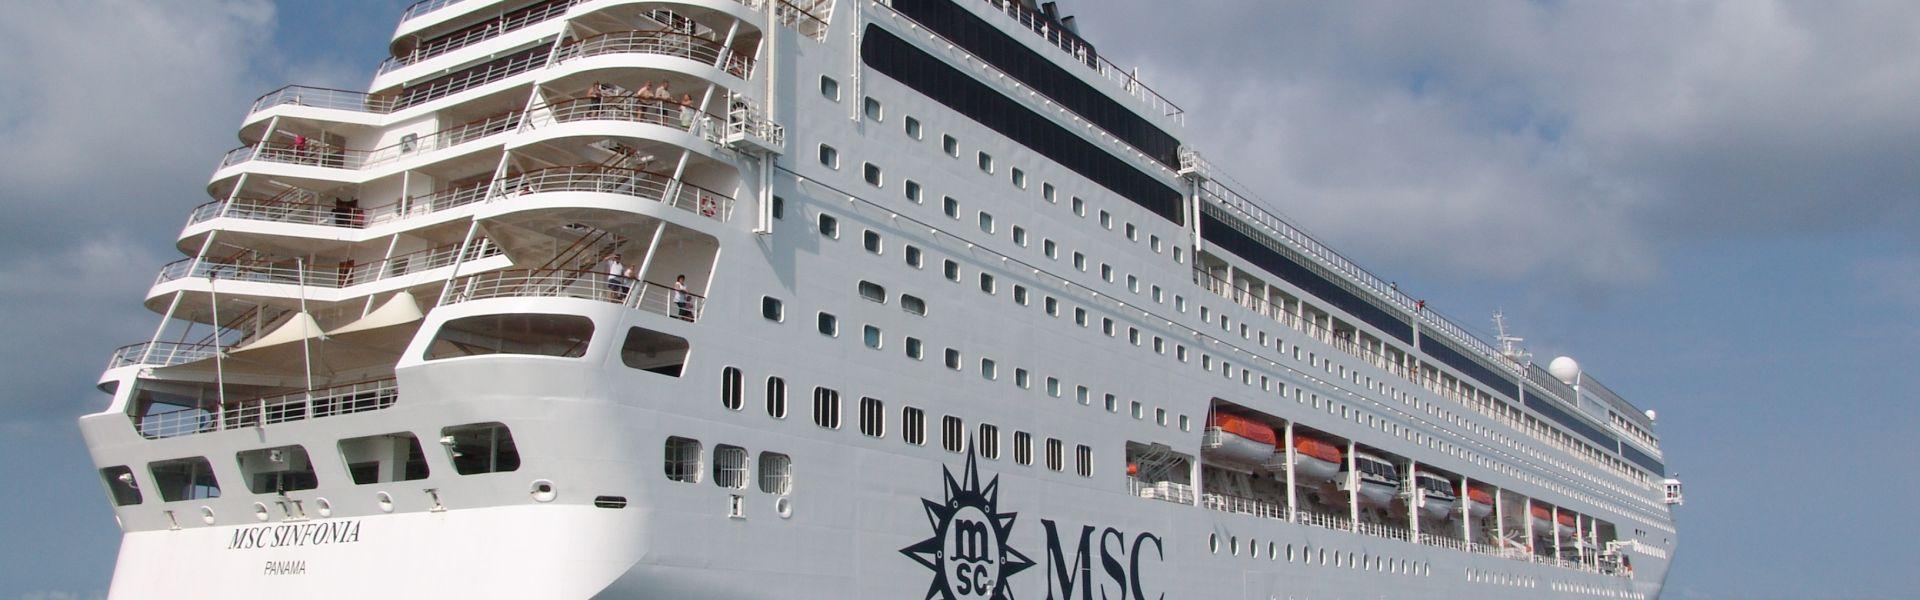 Croaziera 2018/2019 - Mediterana de Vest (Genova) - MSC Cruises - MSC Sinfonia - 10 nopti